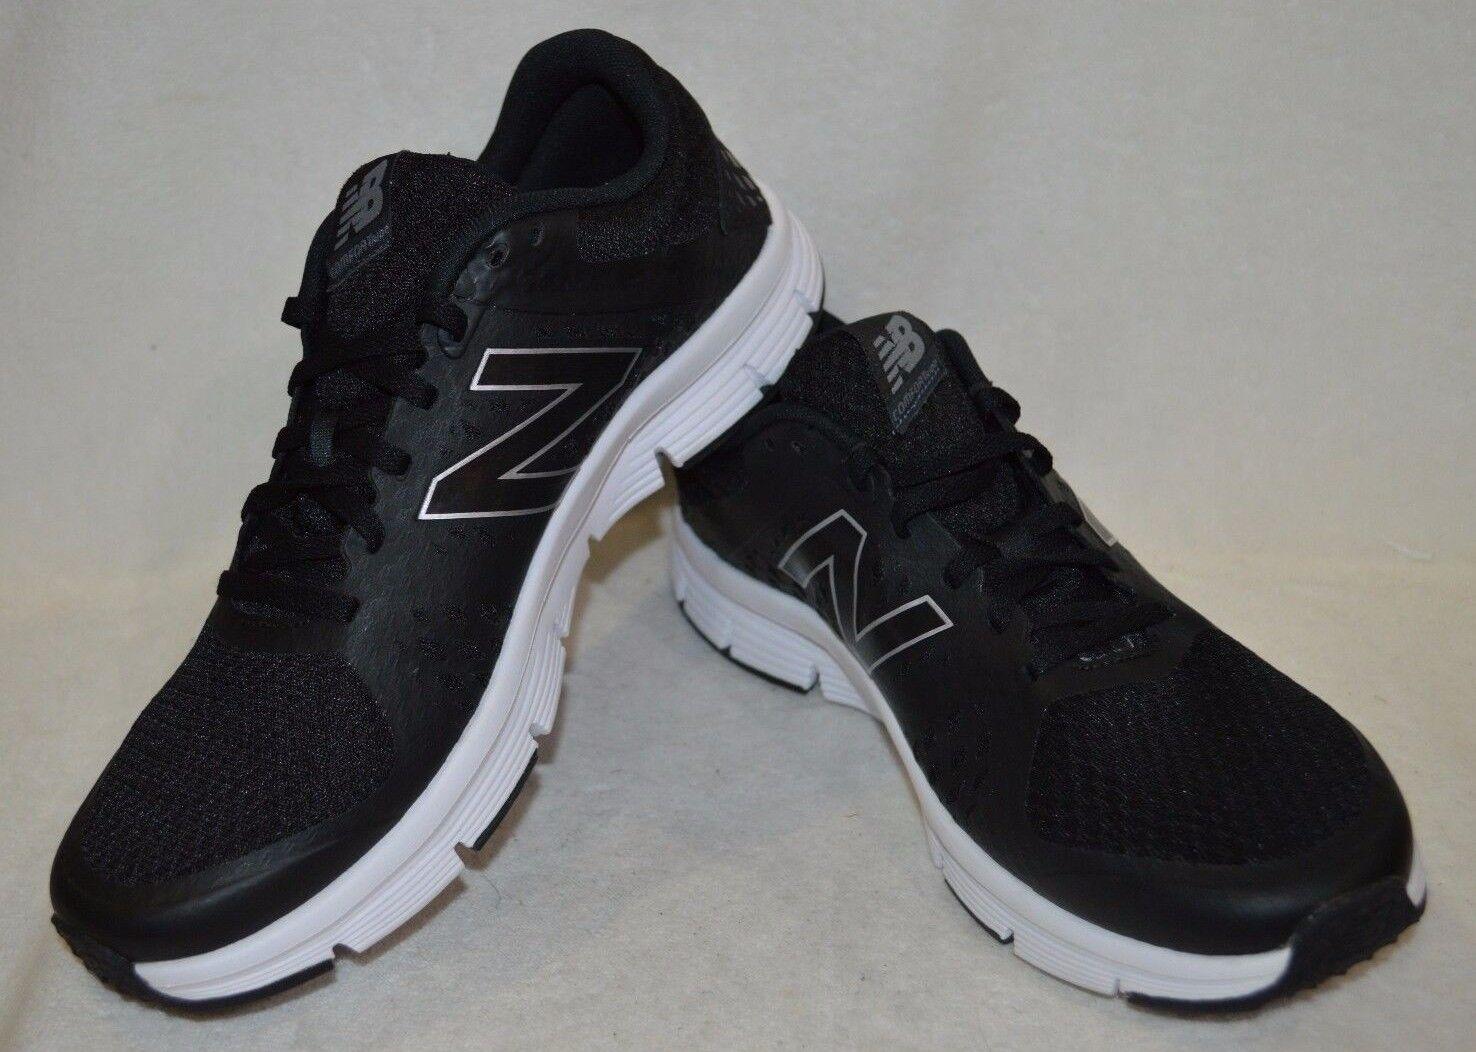 New Balance Men's ME771LB2  Black  Silver White Running shoes - Size 9.5 NWB